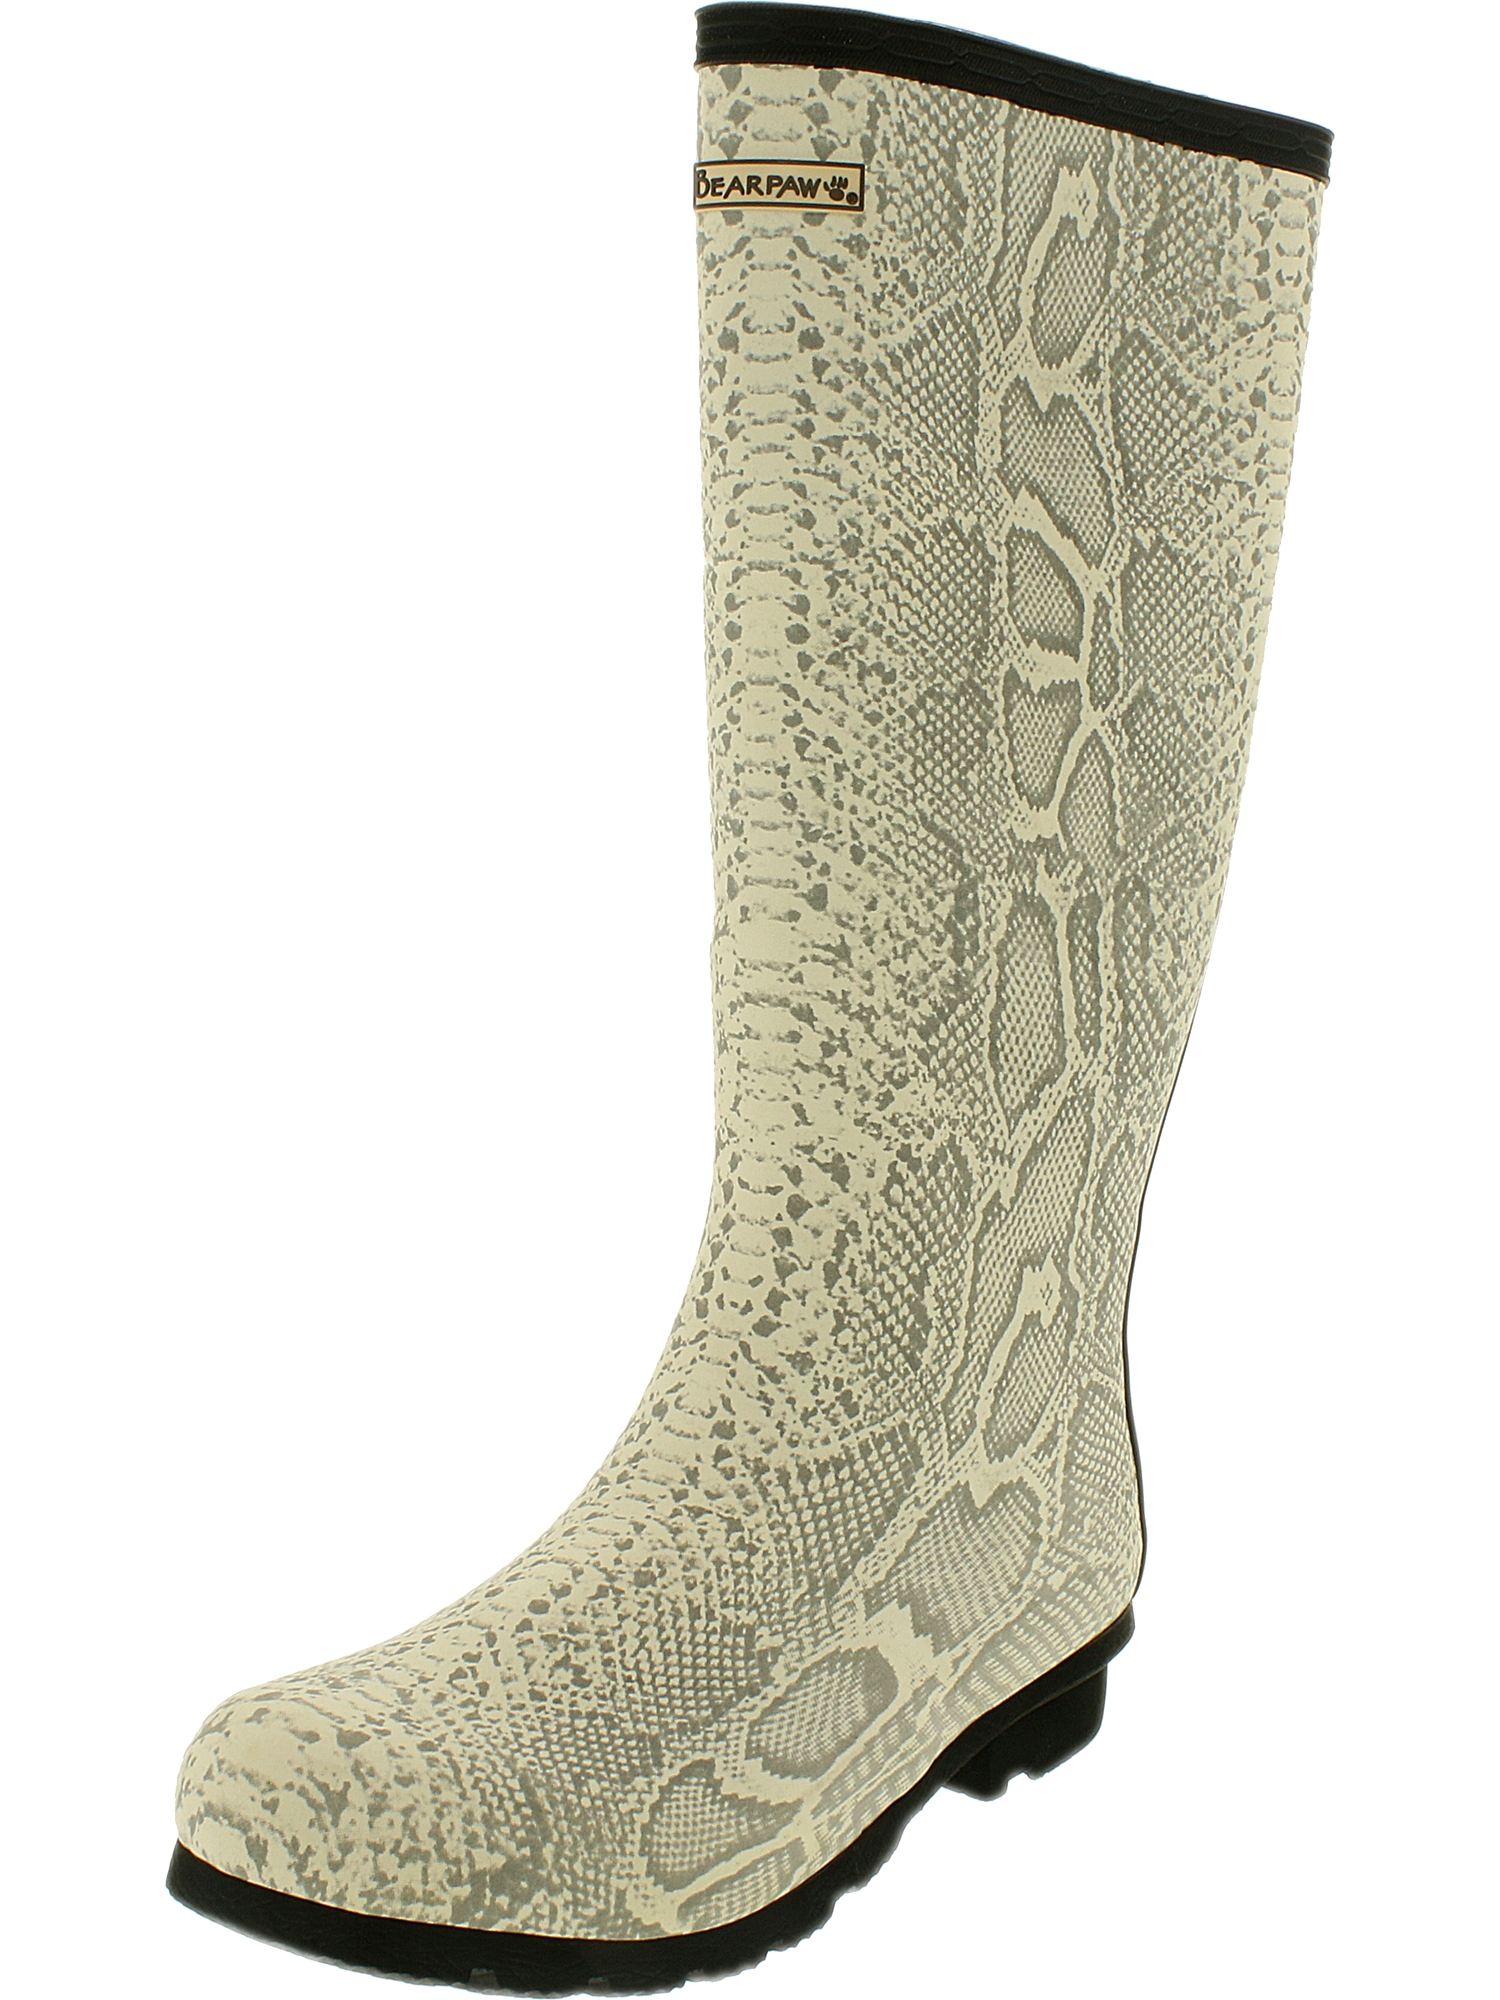 Bearpaw Women's Constance Natural Snake Print Knee-High Rubber Rain Boot 7M by Bearpaw